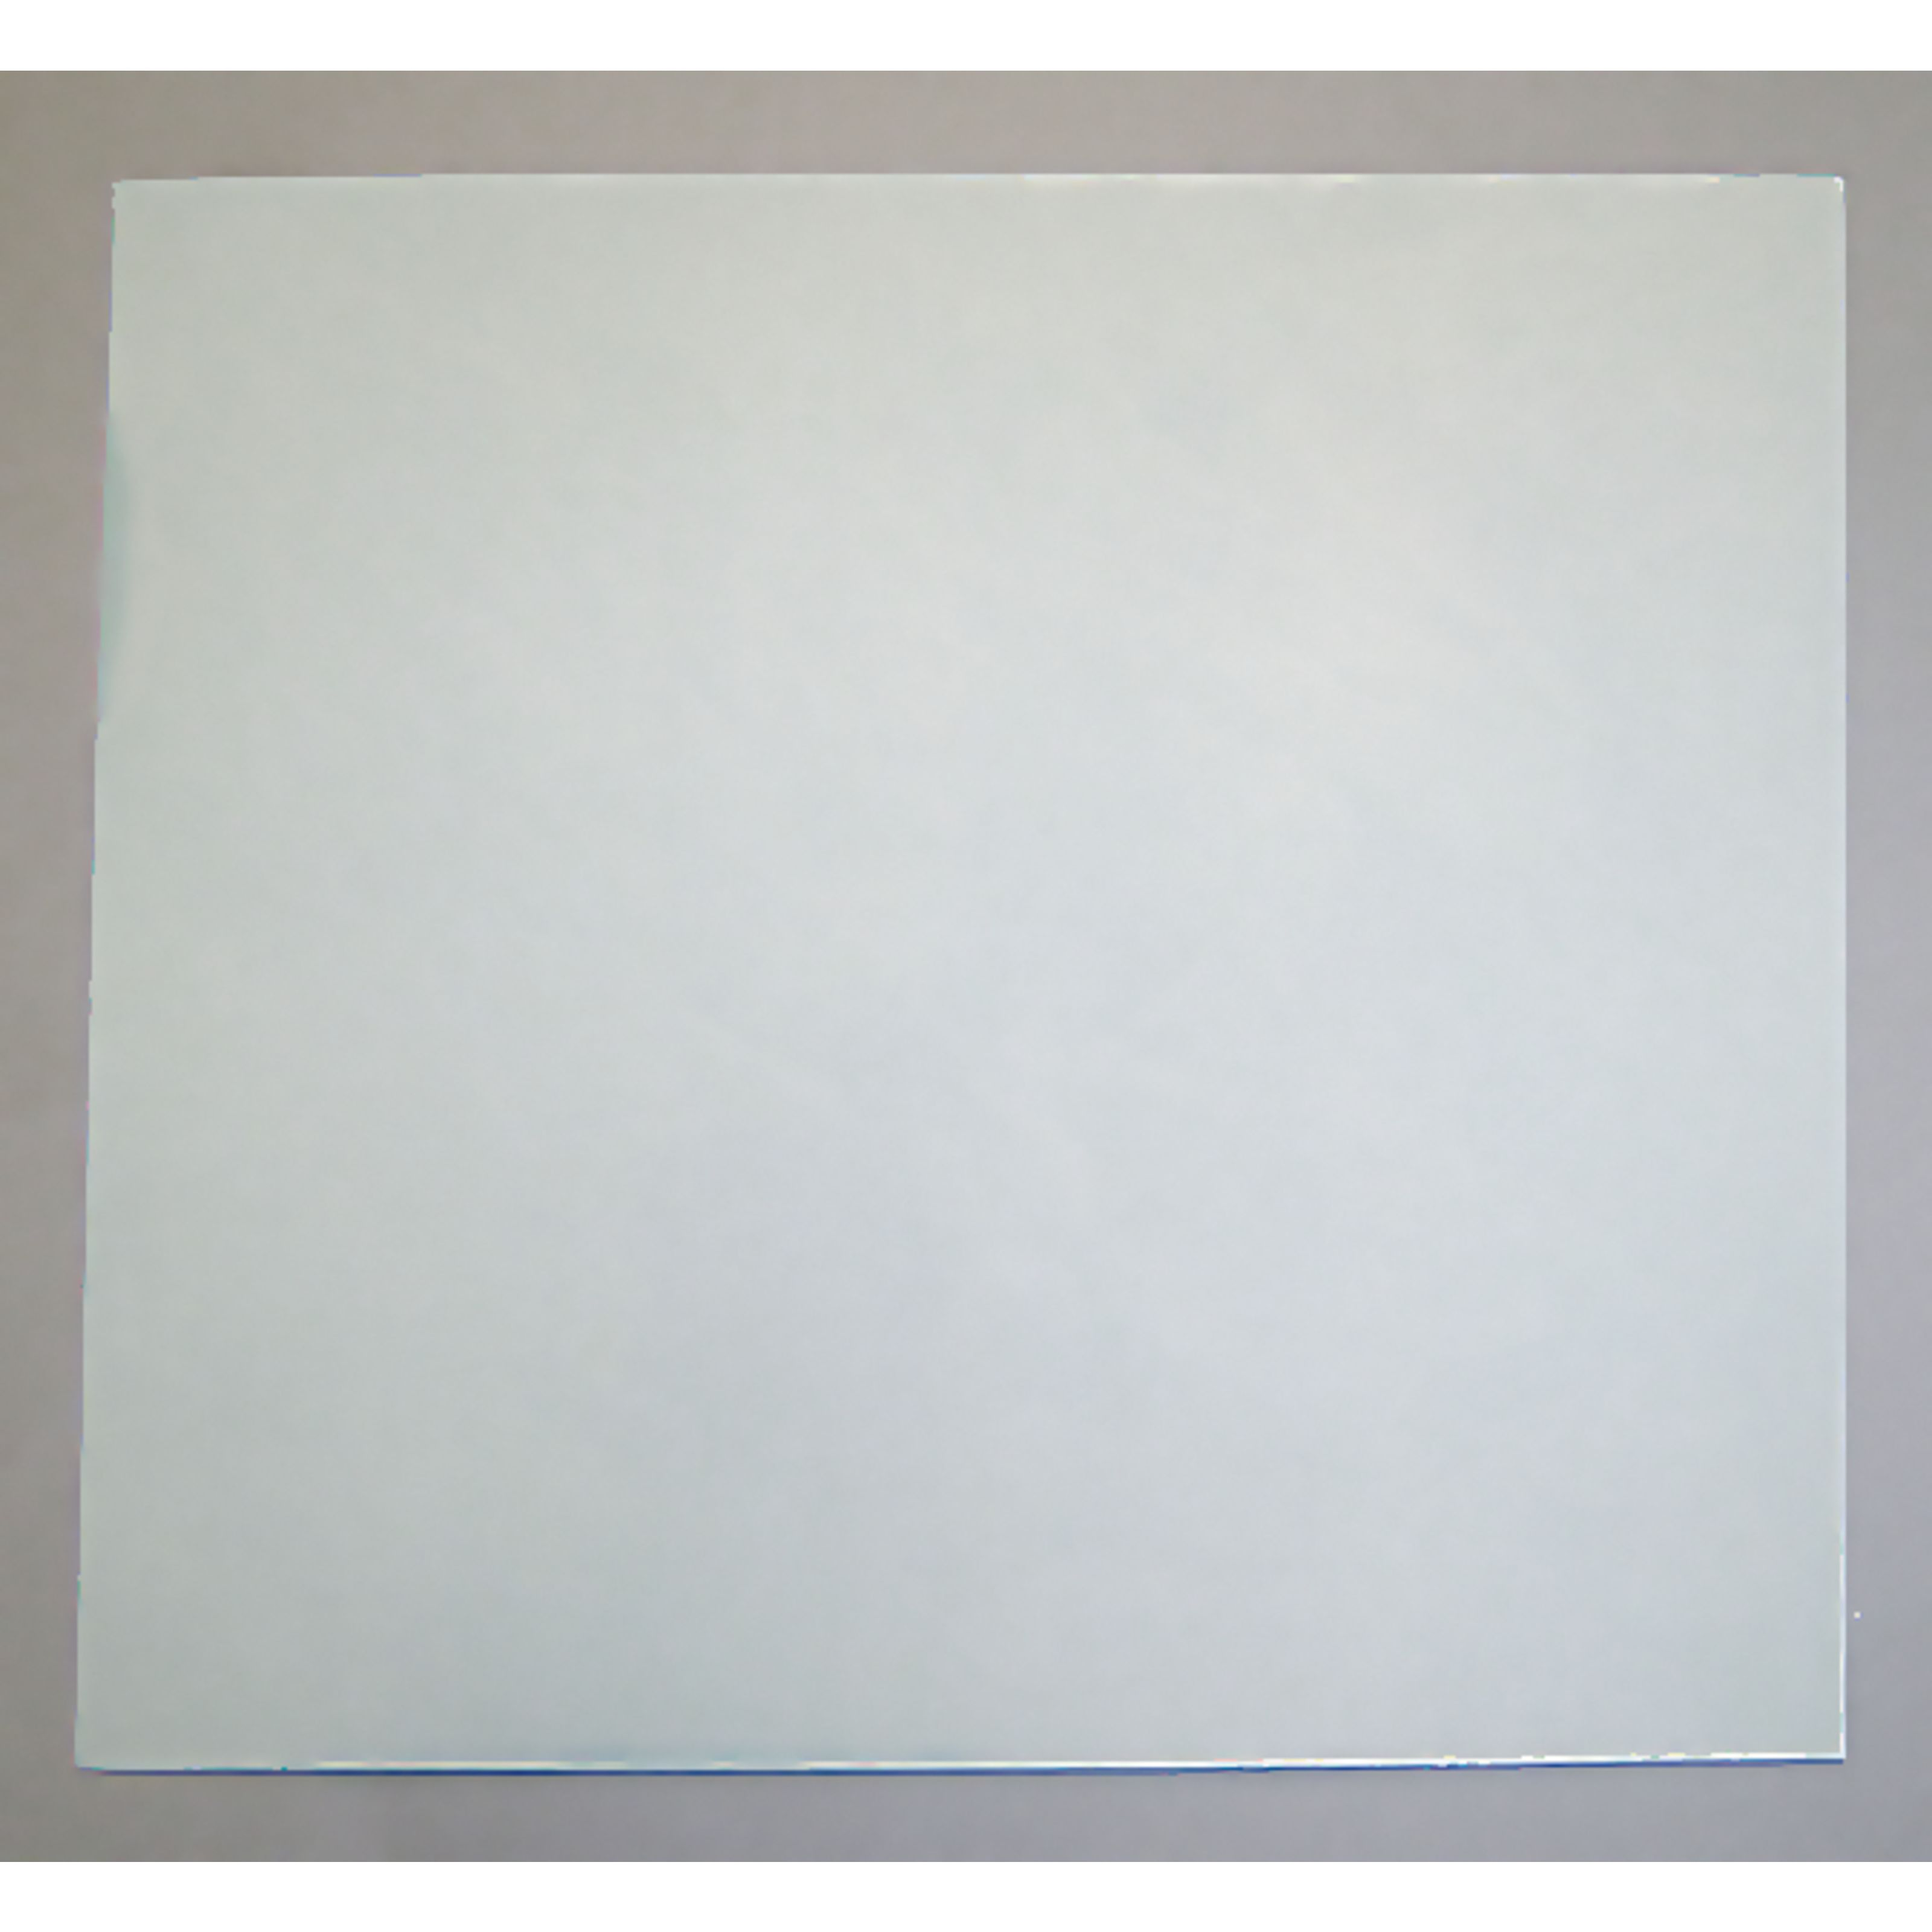 Göldo - Pickguard durchsichtig 20 x 20 selbstklebend PG00A